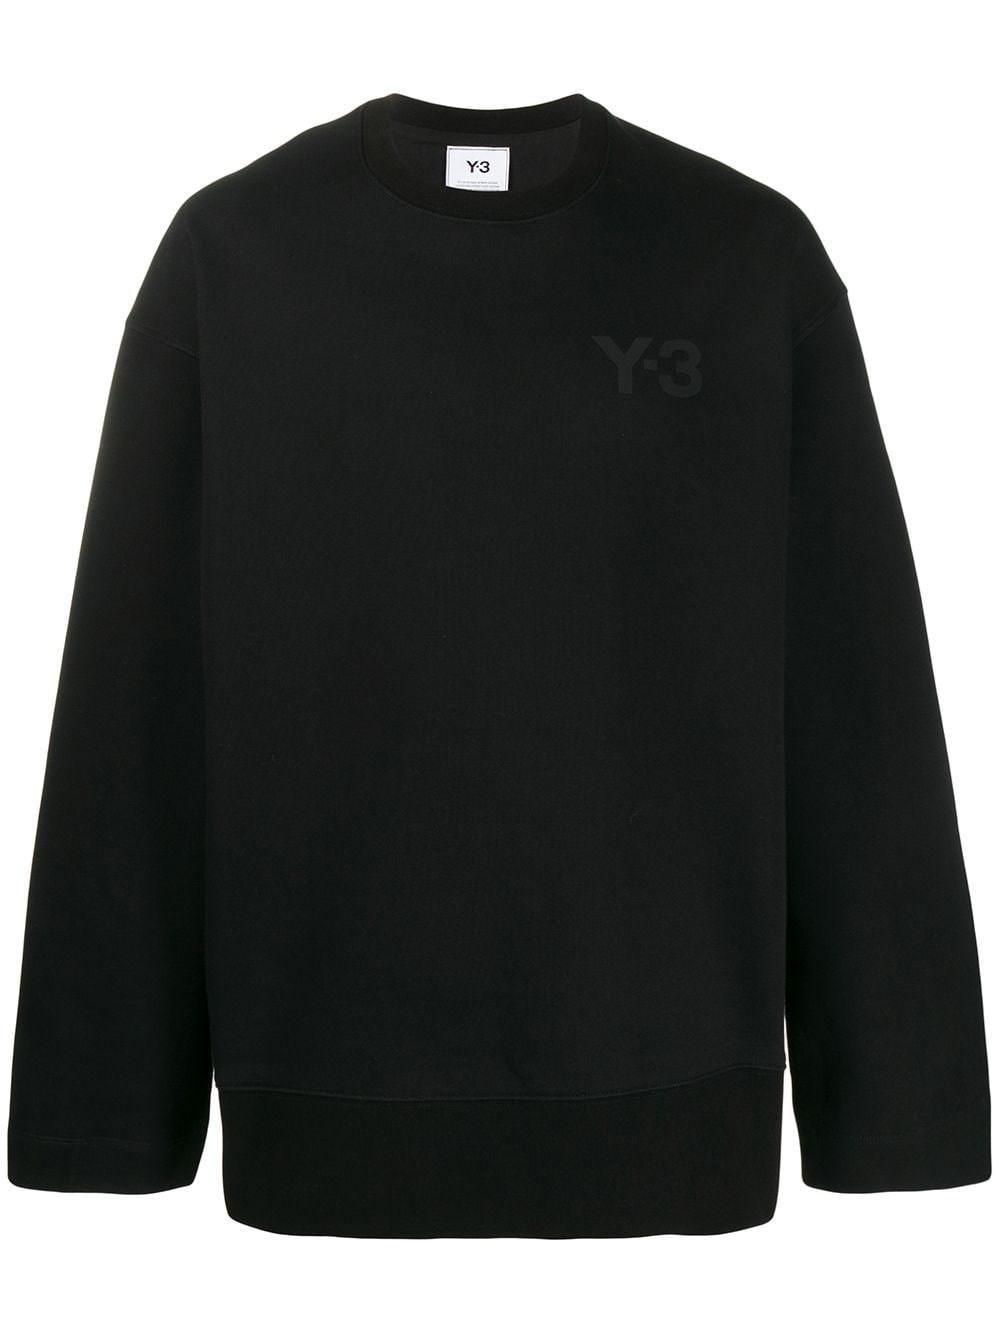 ADIDAS Y-3 Black Oversize Sweatshirt